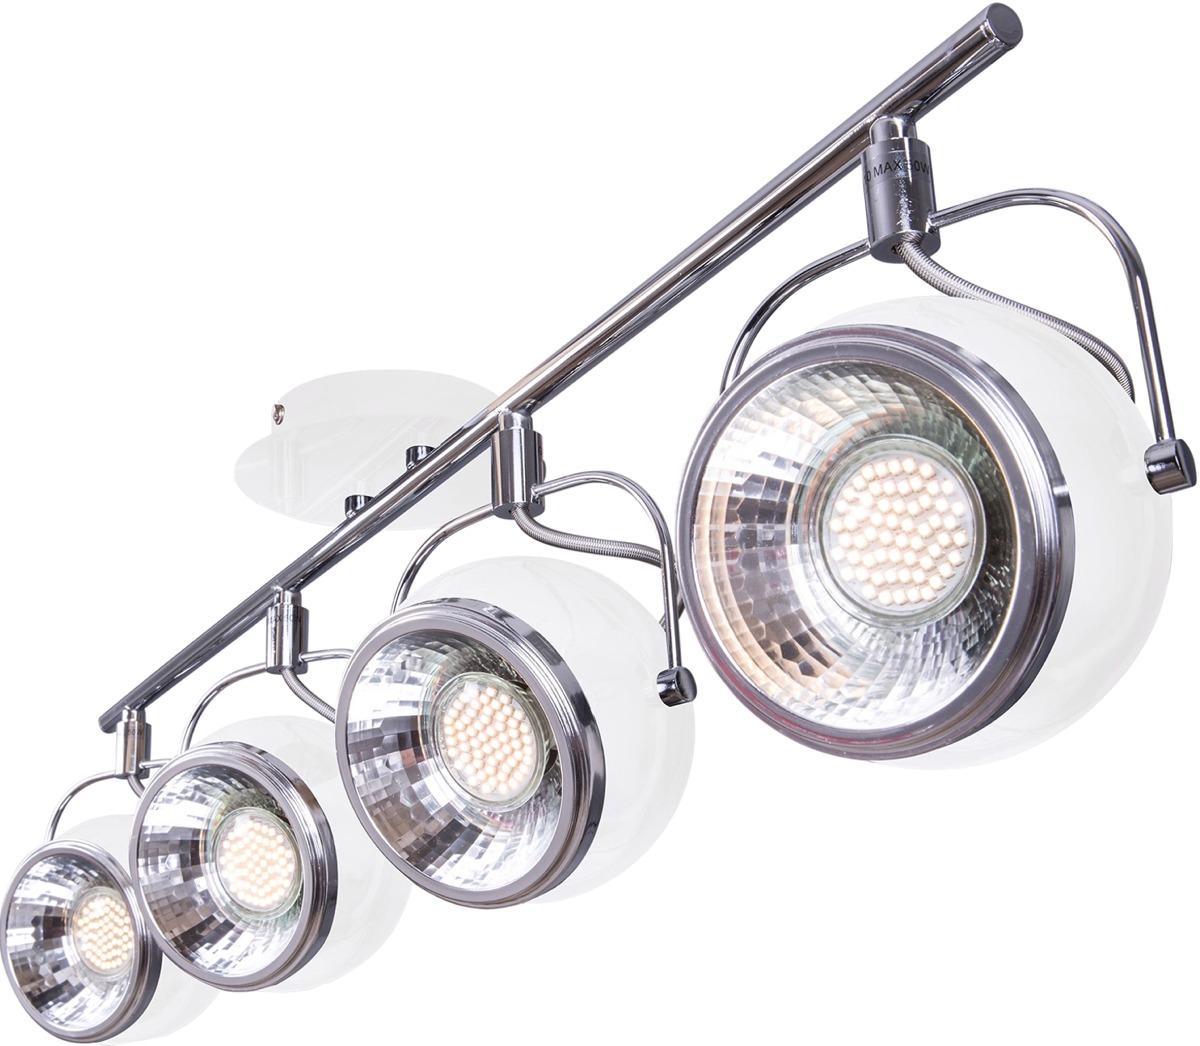 Retro Strahler GU10 Spot Serie Leuchte Lampe Decke ...